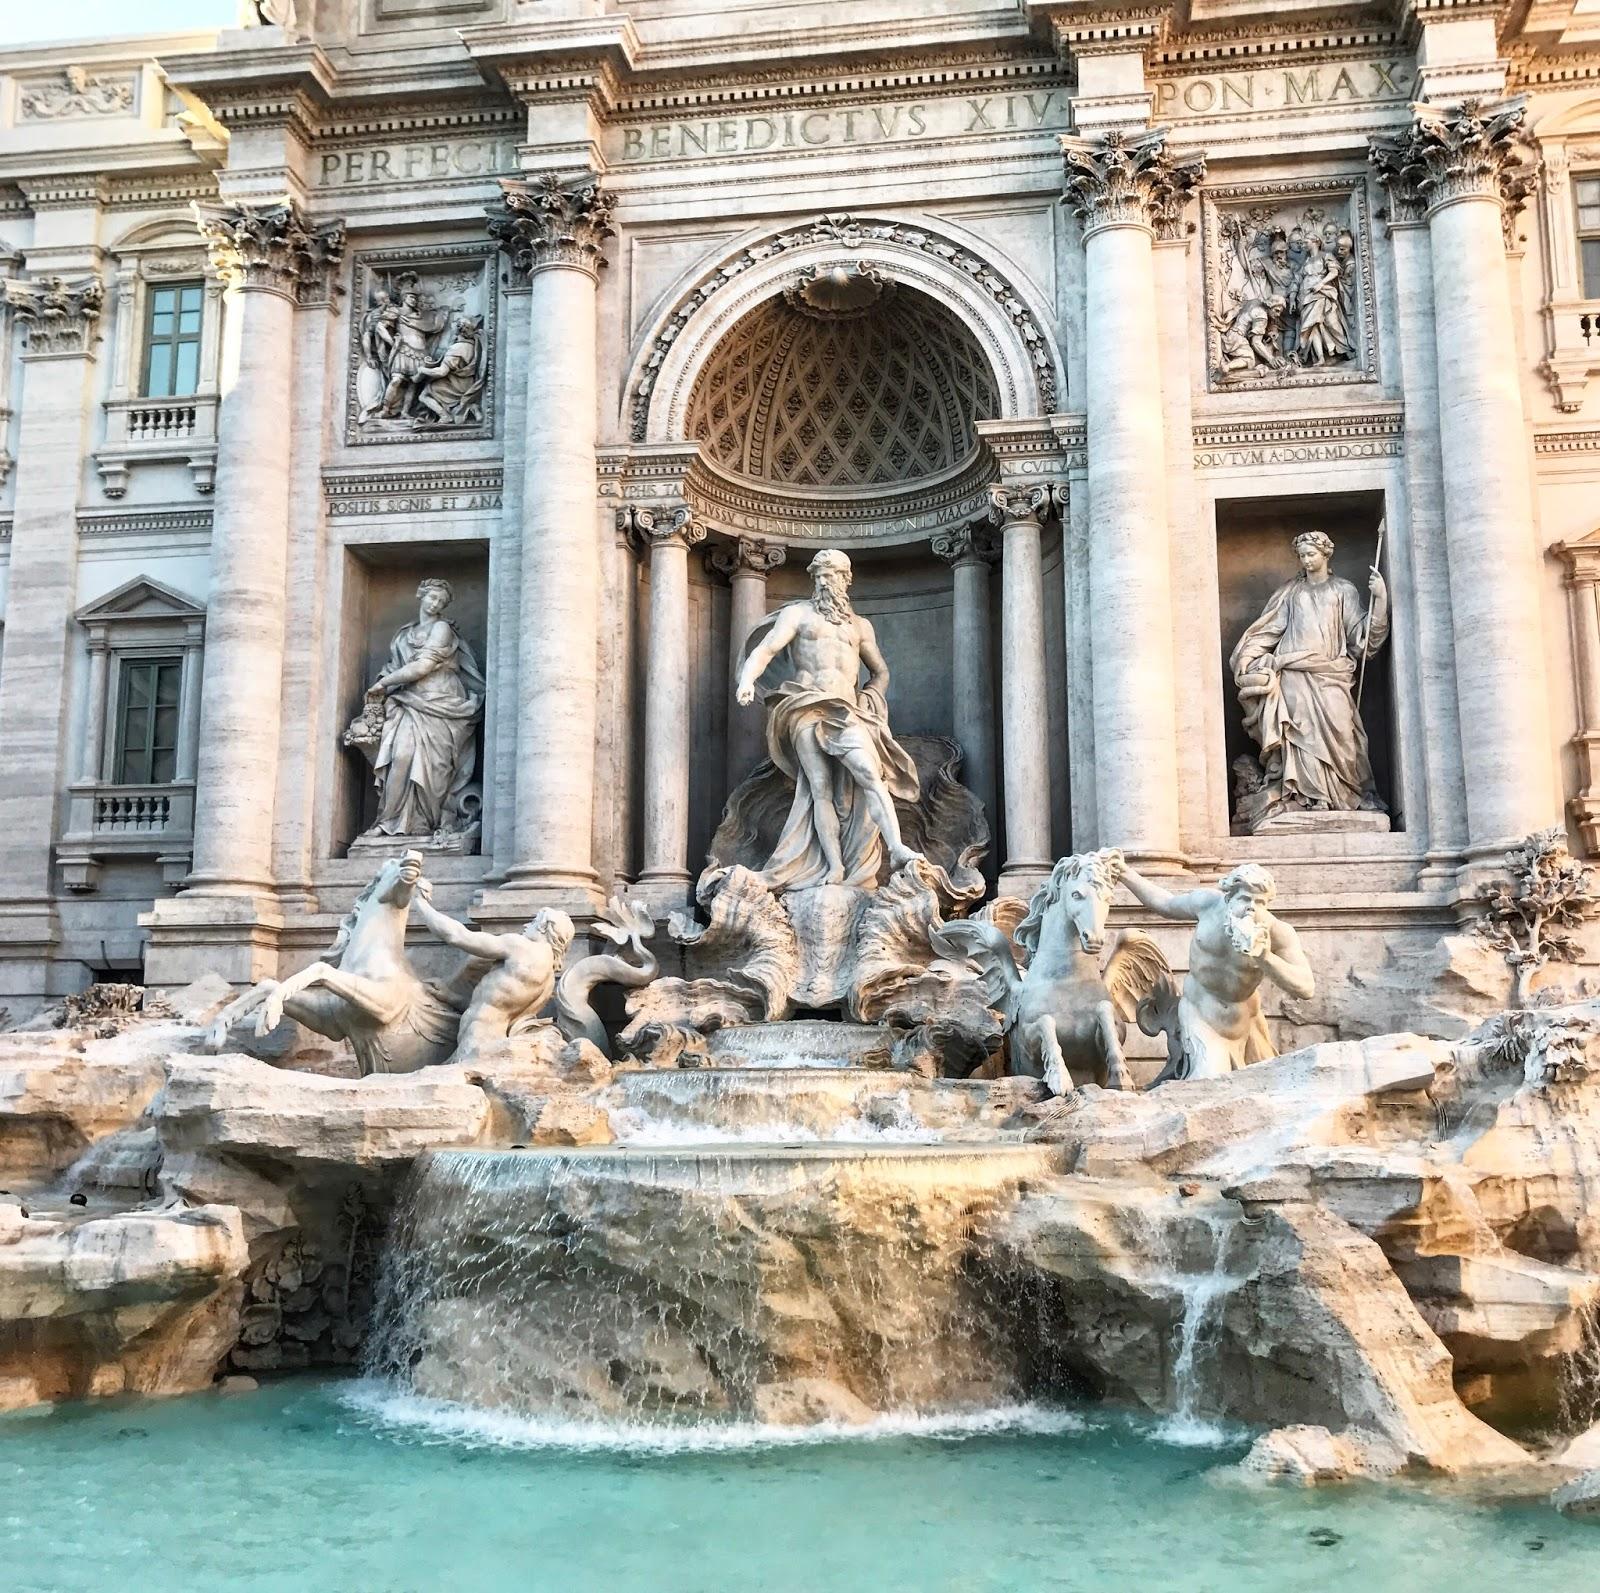 fashion need weekly review, fashion need, Valentina Rago, Roma, visiting Rome, week in Rome, Valentina Rago blog, Valentina Rago fashion need, fashion blog Italia, fashion blog milano